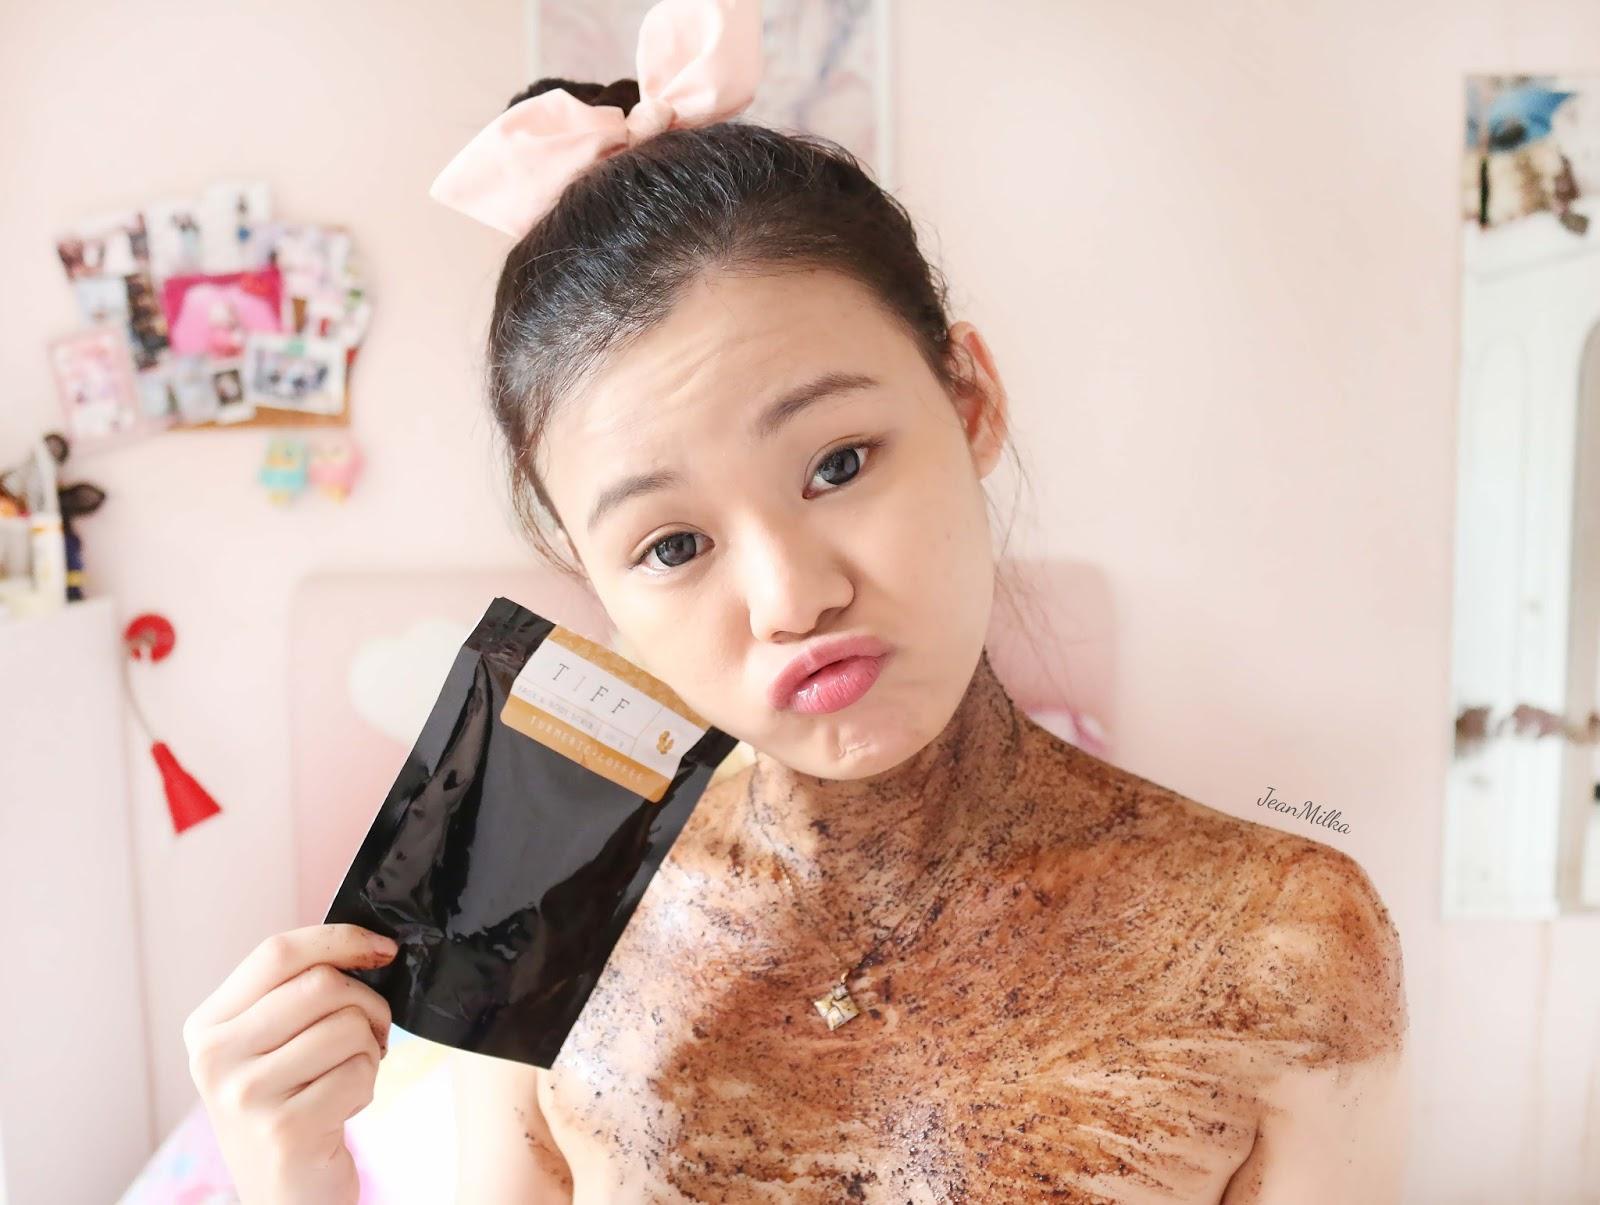 natural skincare, jerawat, acne, solusi jerawat, acne skincare, tiff body, homemade skincare, skicnare natural, coffee scrub, scrub